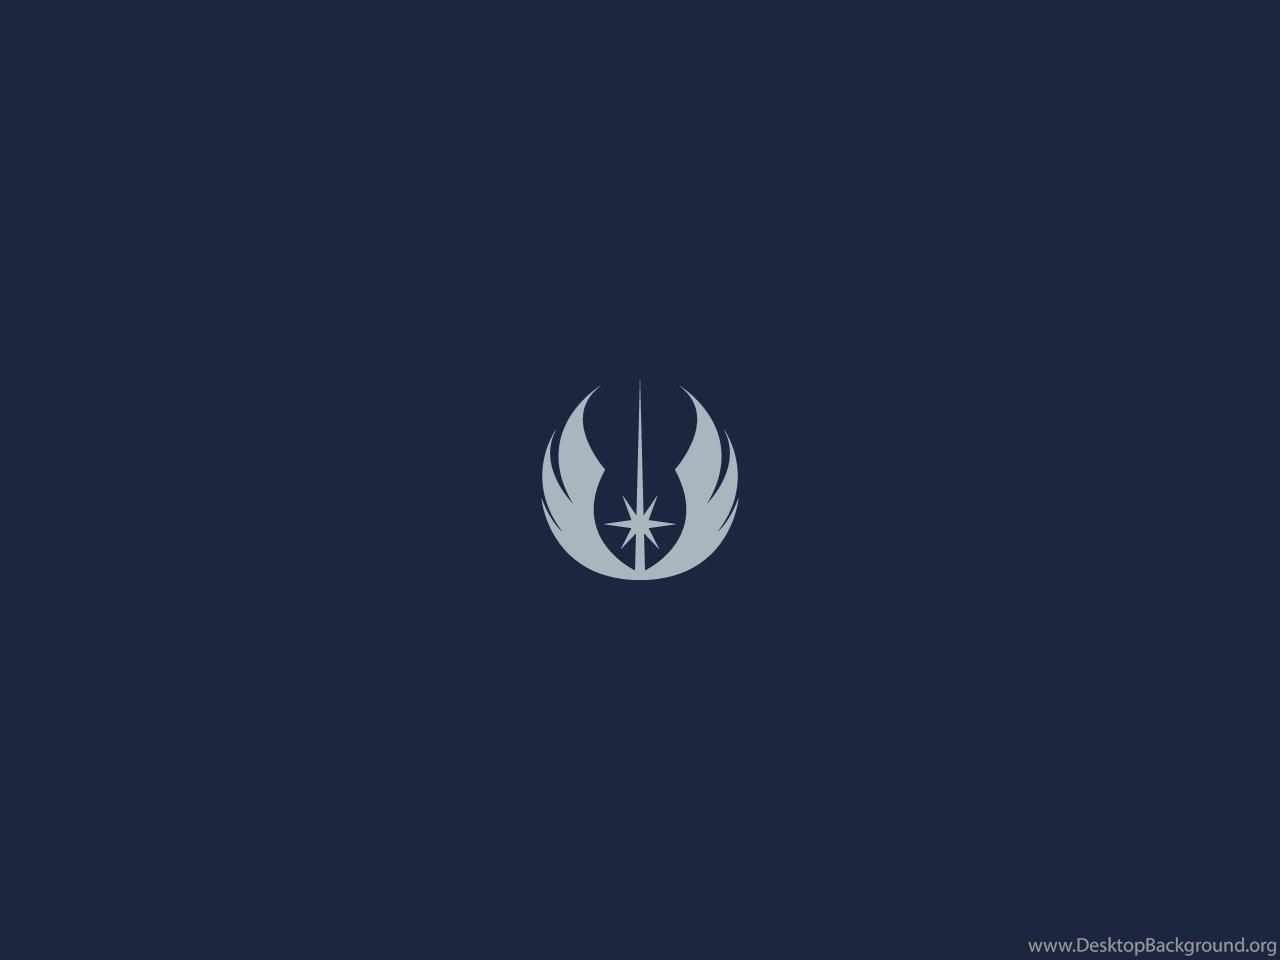 Jedi Logo Wallpapers Desktop Background